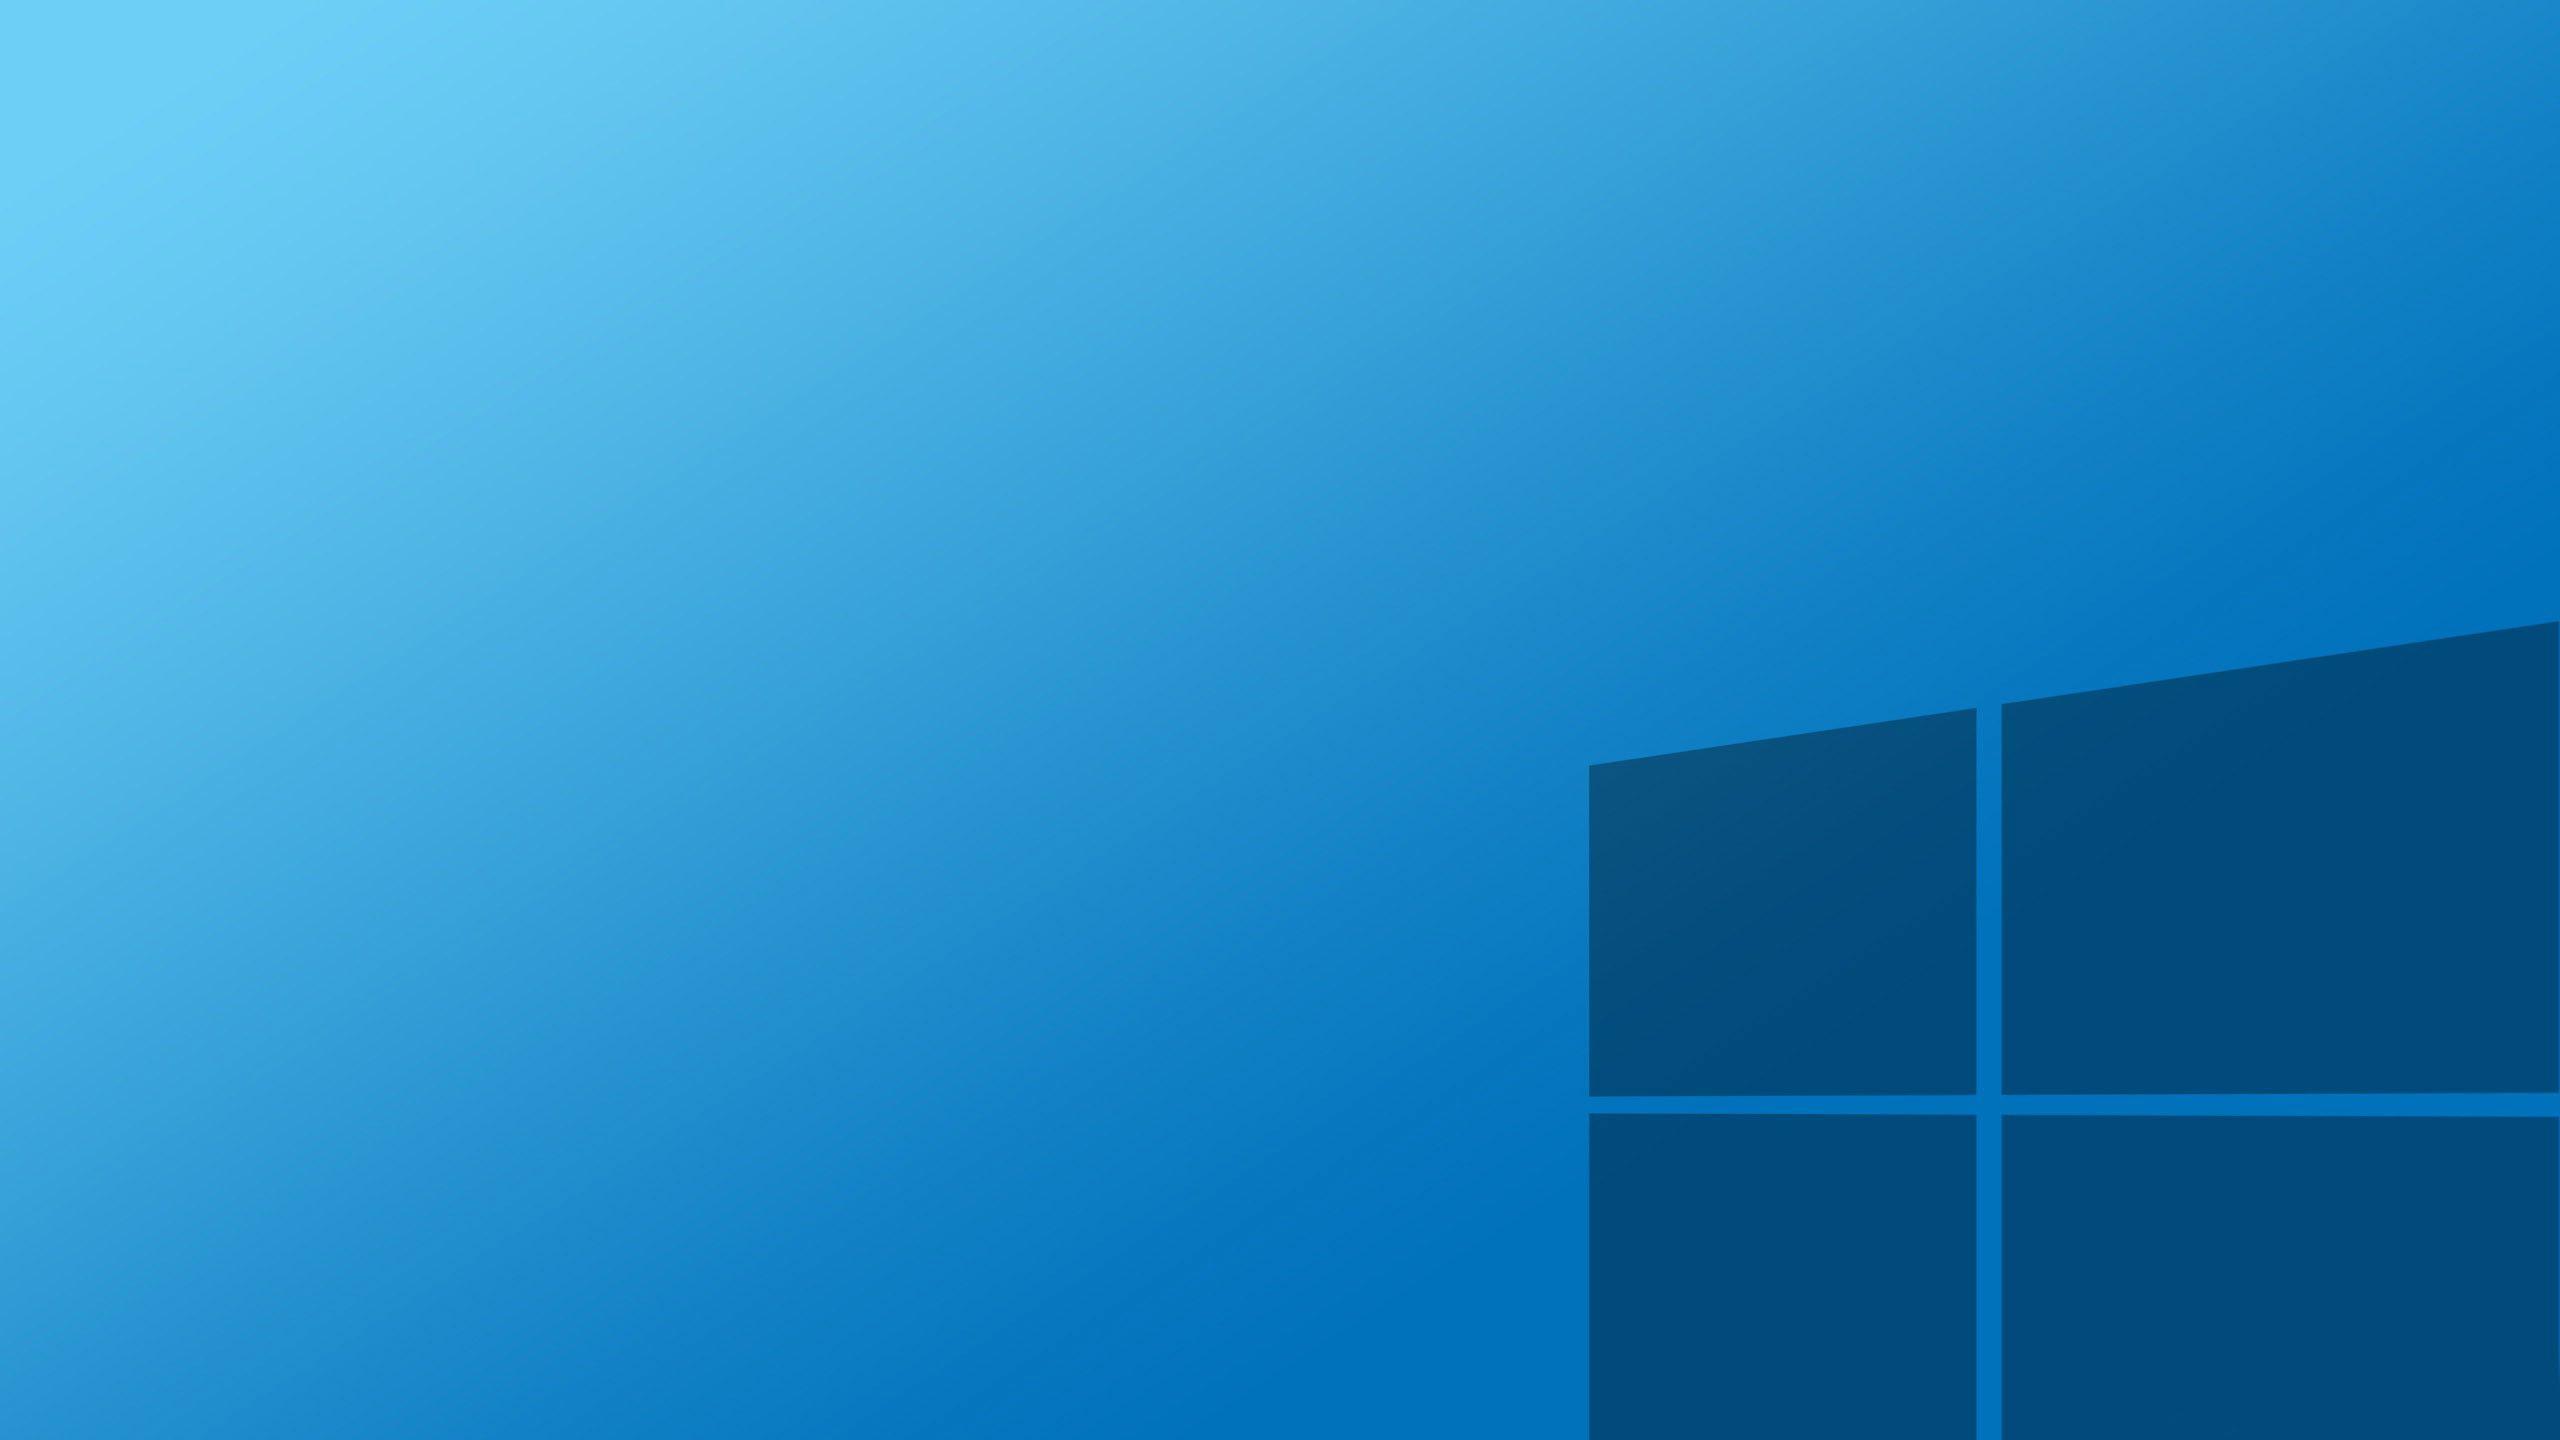 2560x1440 Windows 10 Wallpapers Hd 164 Hd Wallpaper Hdwallpapere Com Wallpaper Windows 10 Windows Wallpaper Windows 10 Background